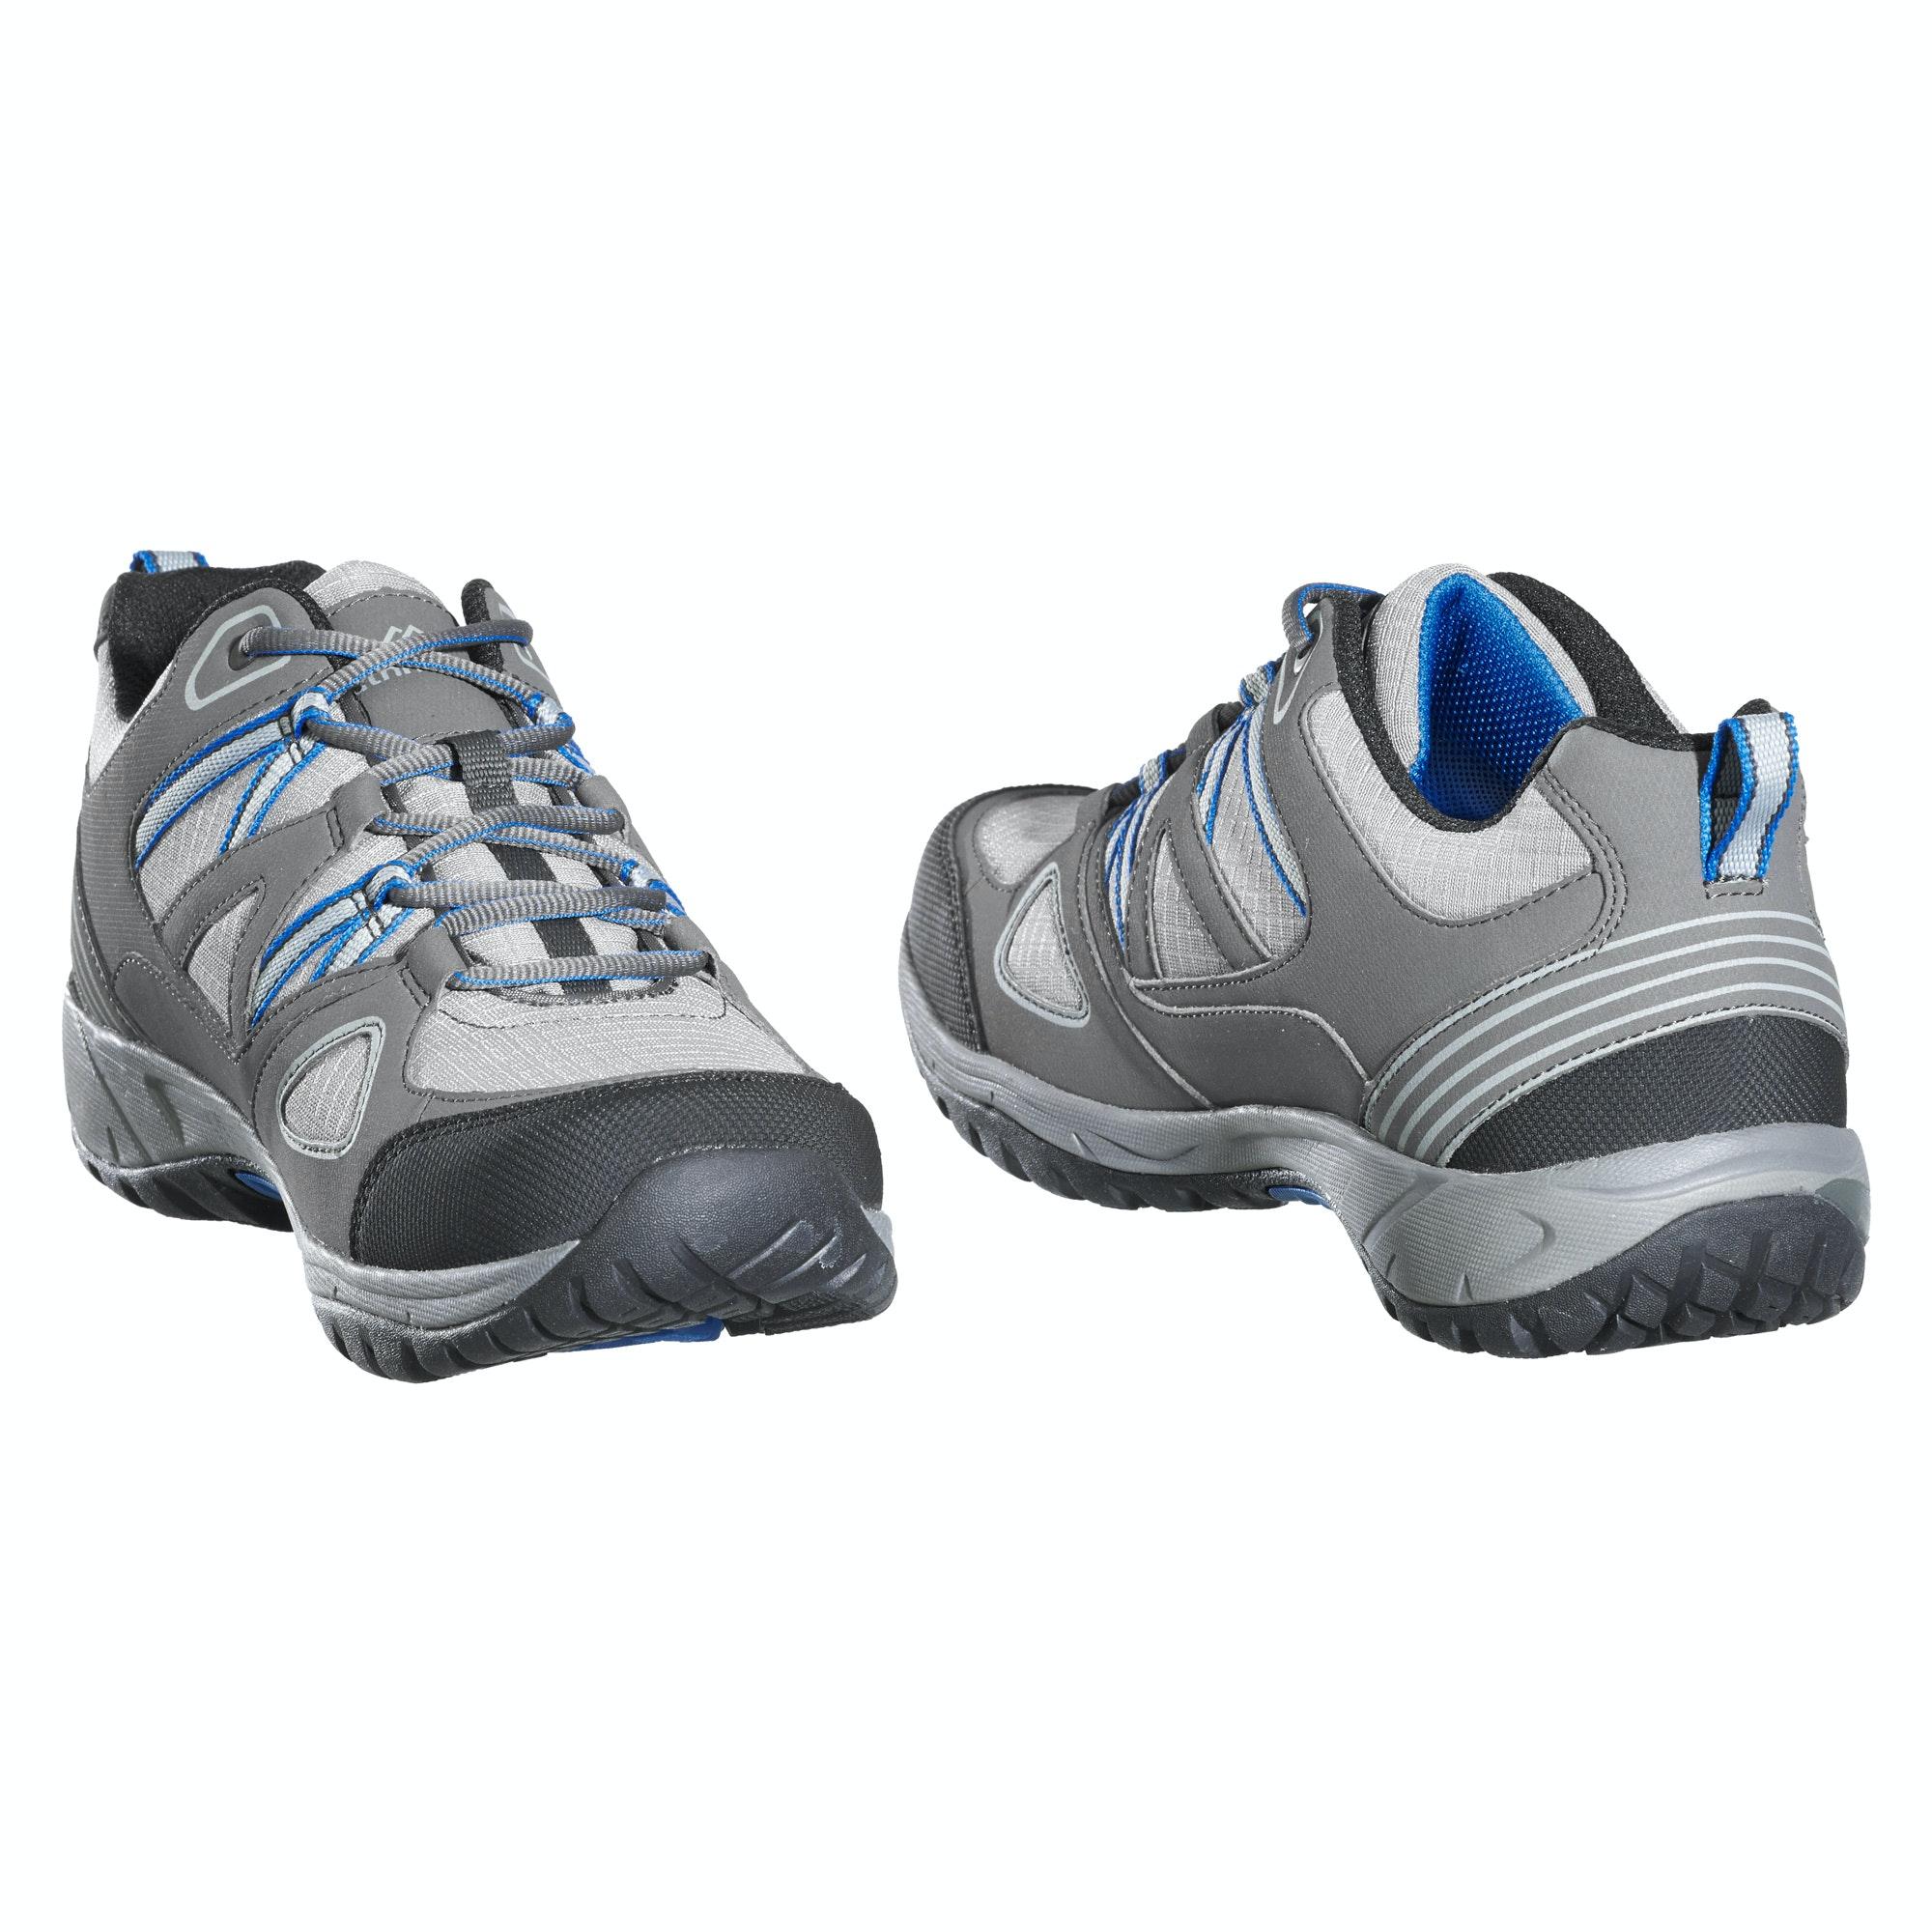 NEW-Kathmandu-Serpentine-II-Men-039-s-Lighweight-Durable-Hiking-Walking-Shoes thumbnail 12